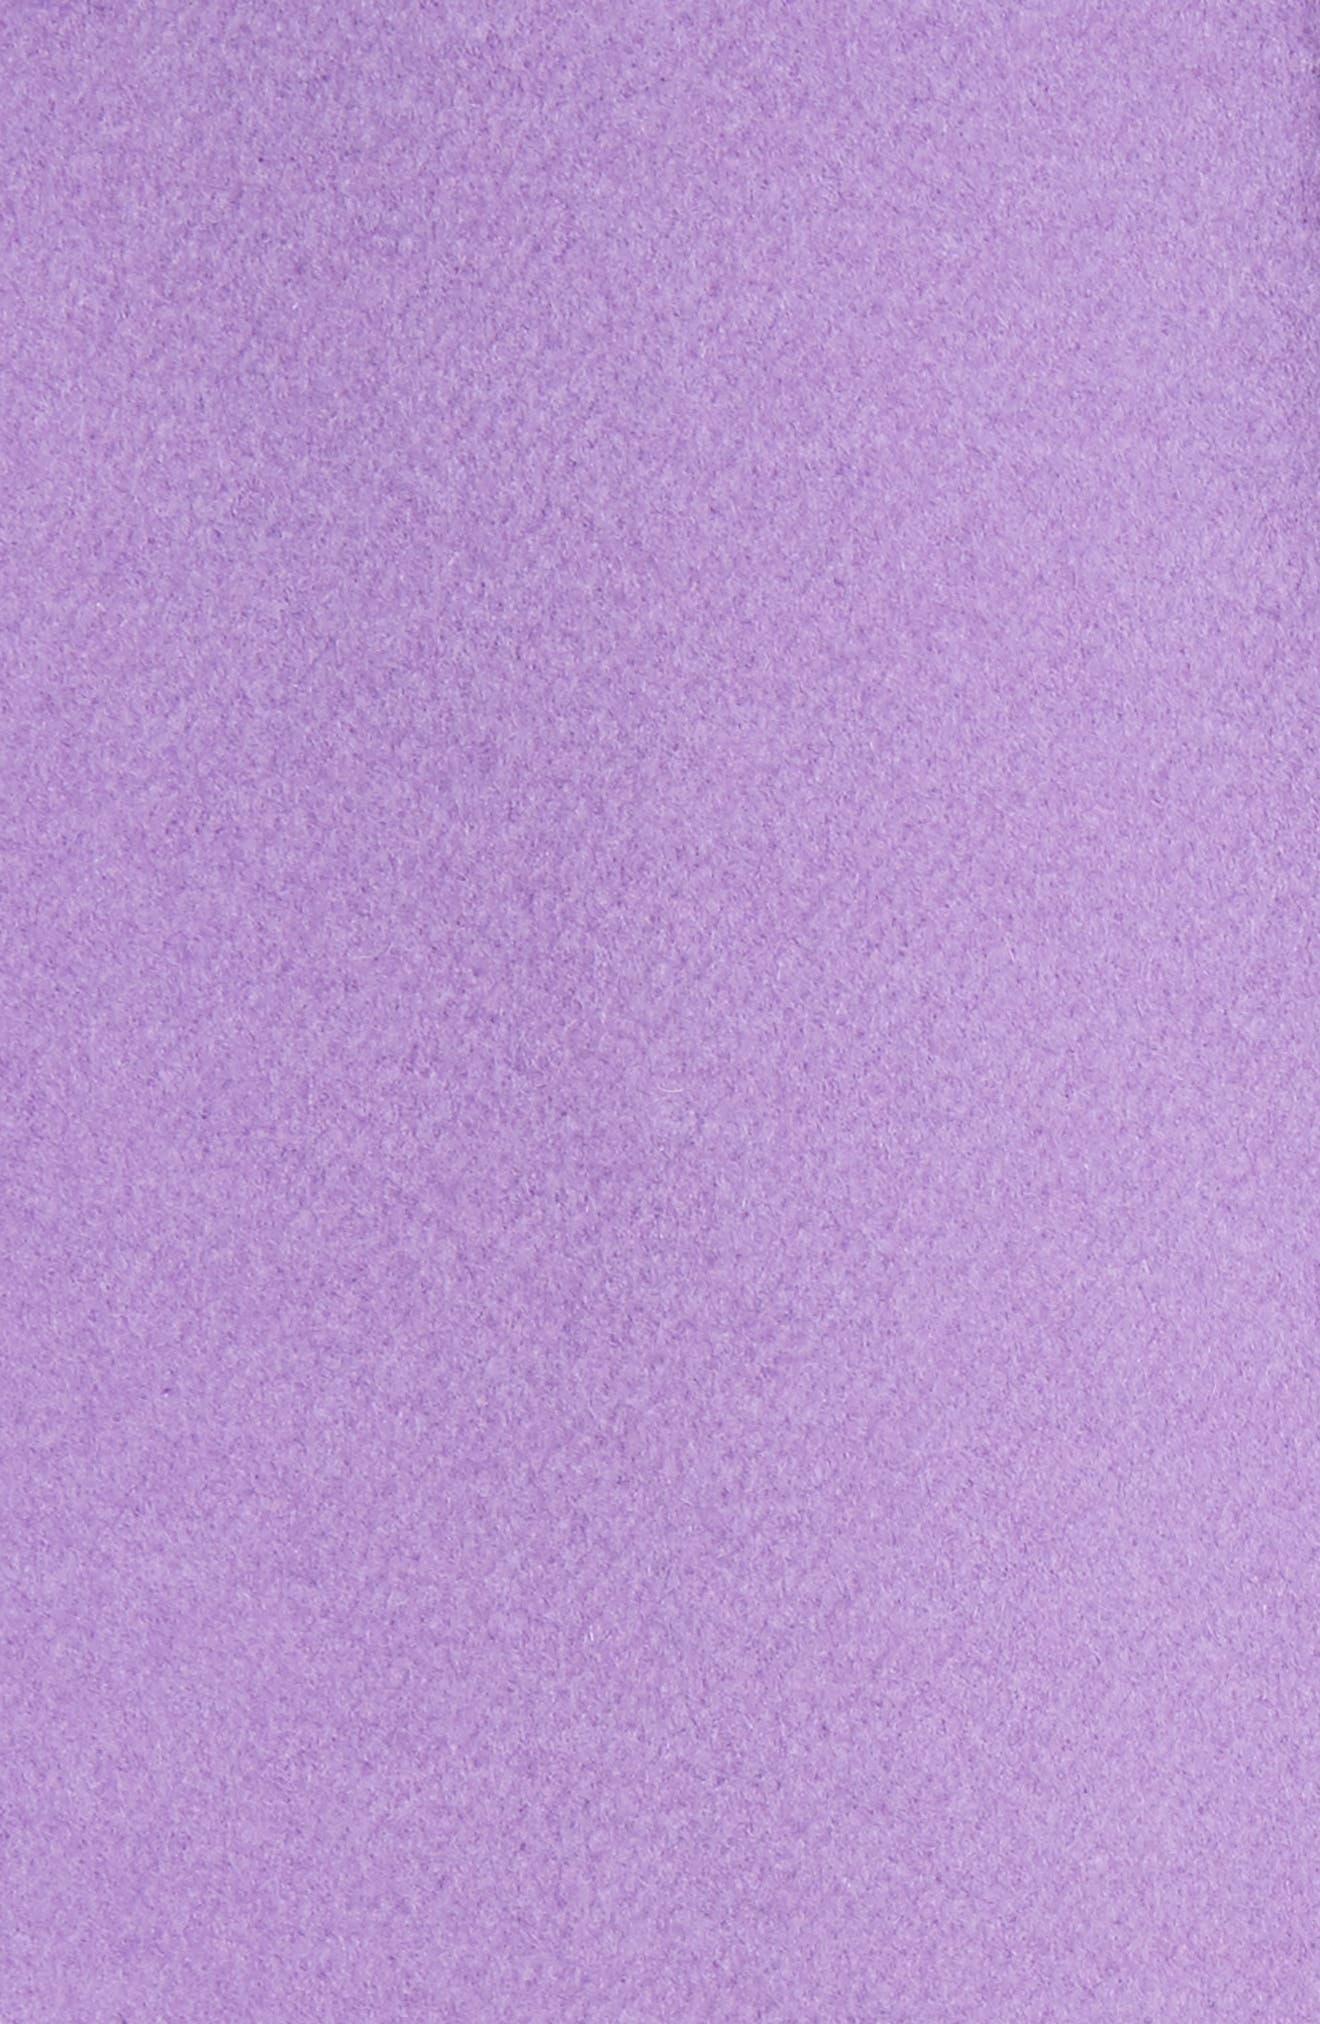 Double Face Wool & Angora Blend Jacket,                             Alternate thumbnail 6, color,                             550